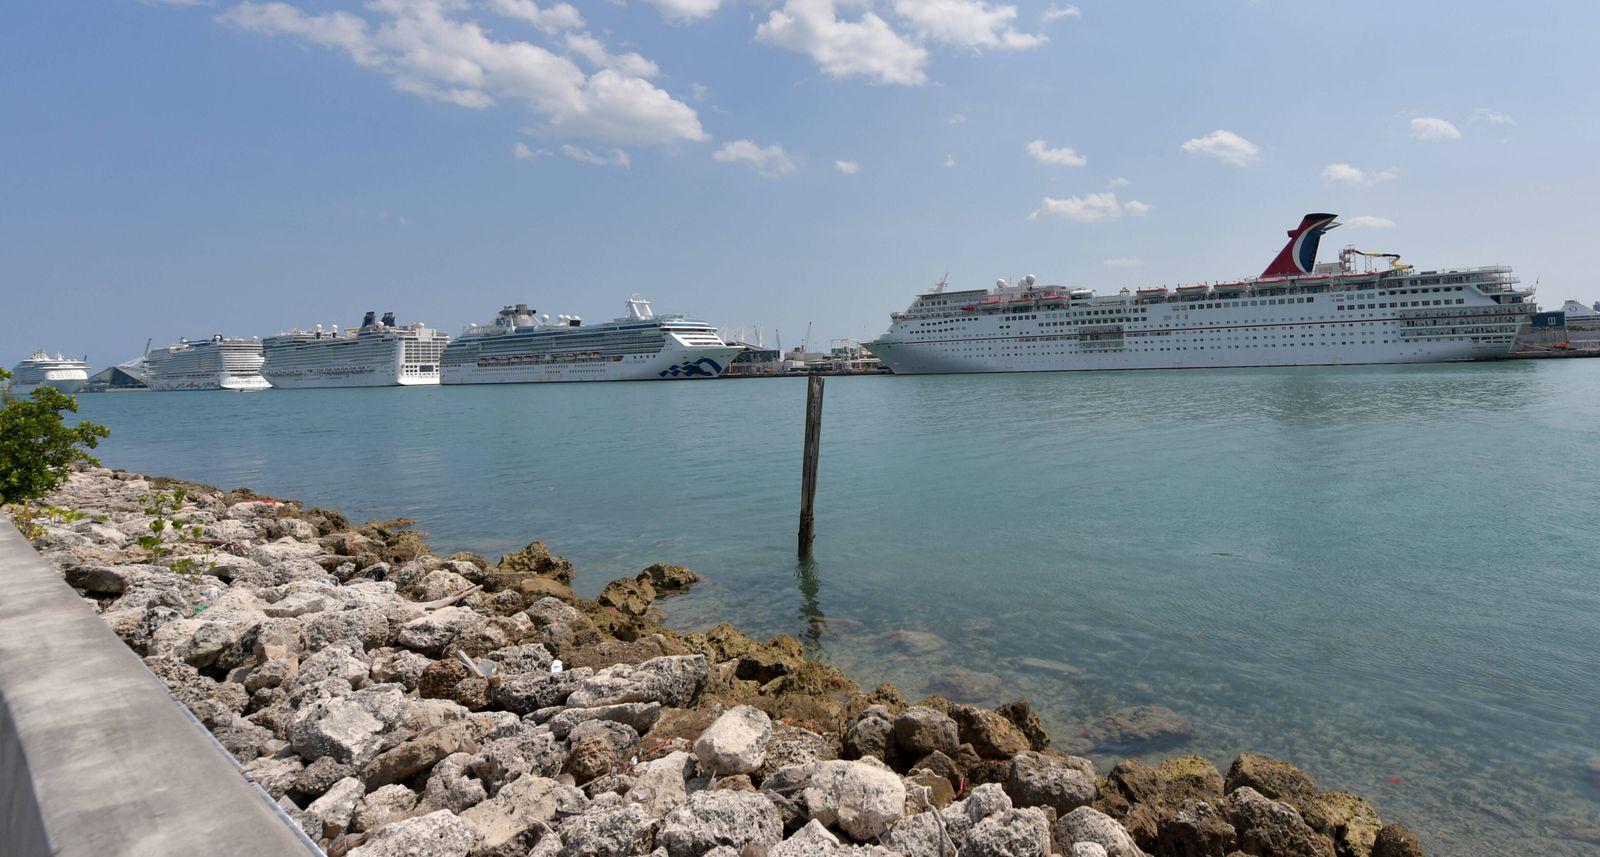 April 9, 2020, Miami Beach, Florida, United States Of America: MIAMI BEACH, FL - APRIL 09: COVID-19: As the Cruise ship